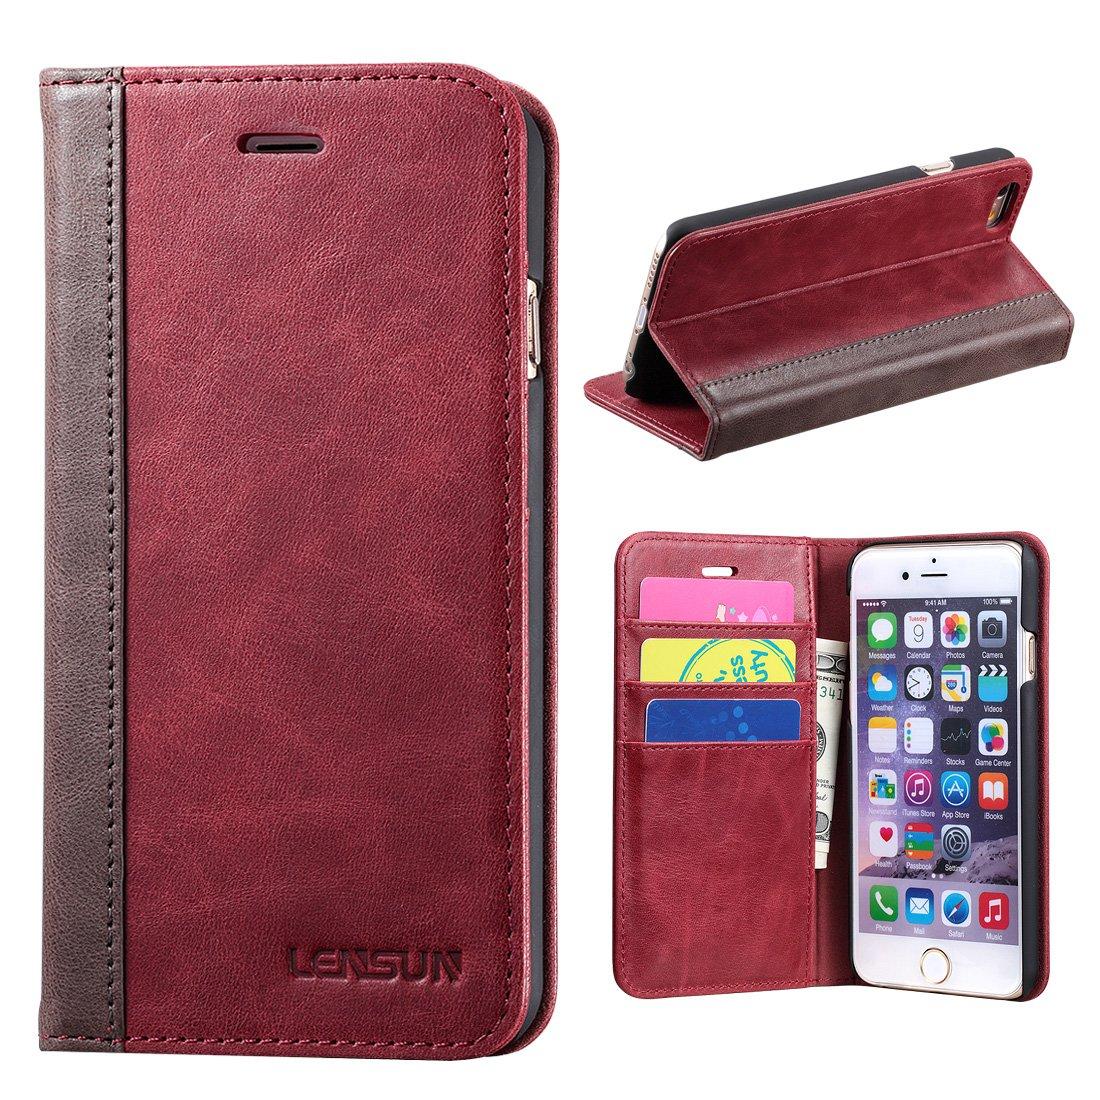 c3de2f5458 iPhone 6 Case, Lensun Genuine Leather Wallet Flip Case Cover for Apple iPhone  6 /